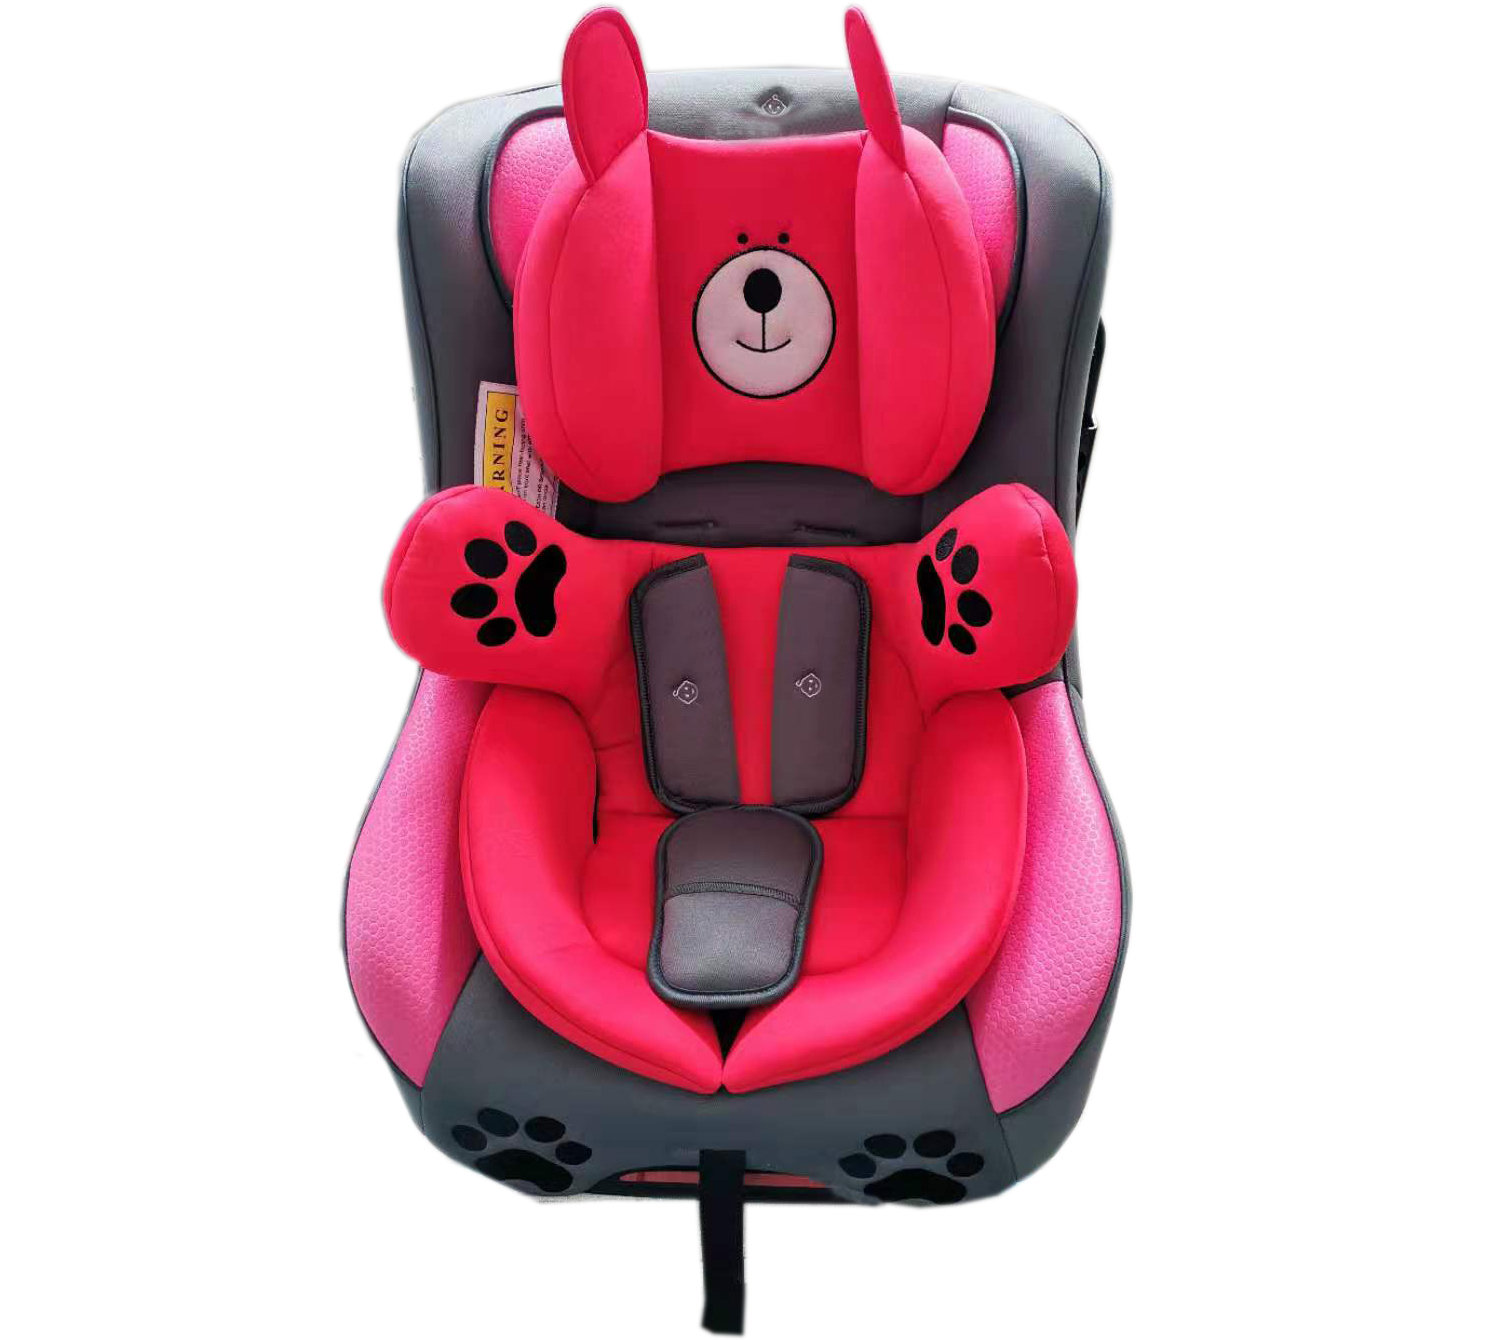 Harari Baby Wholesale used baby car seats company-2